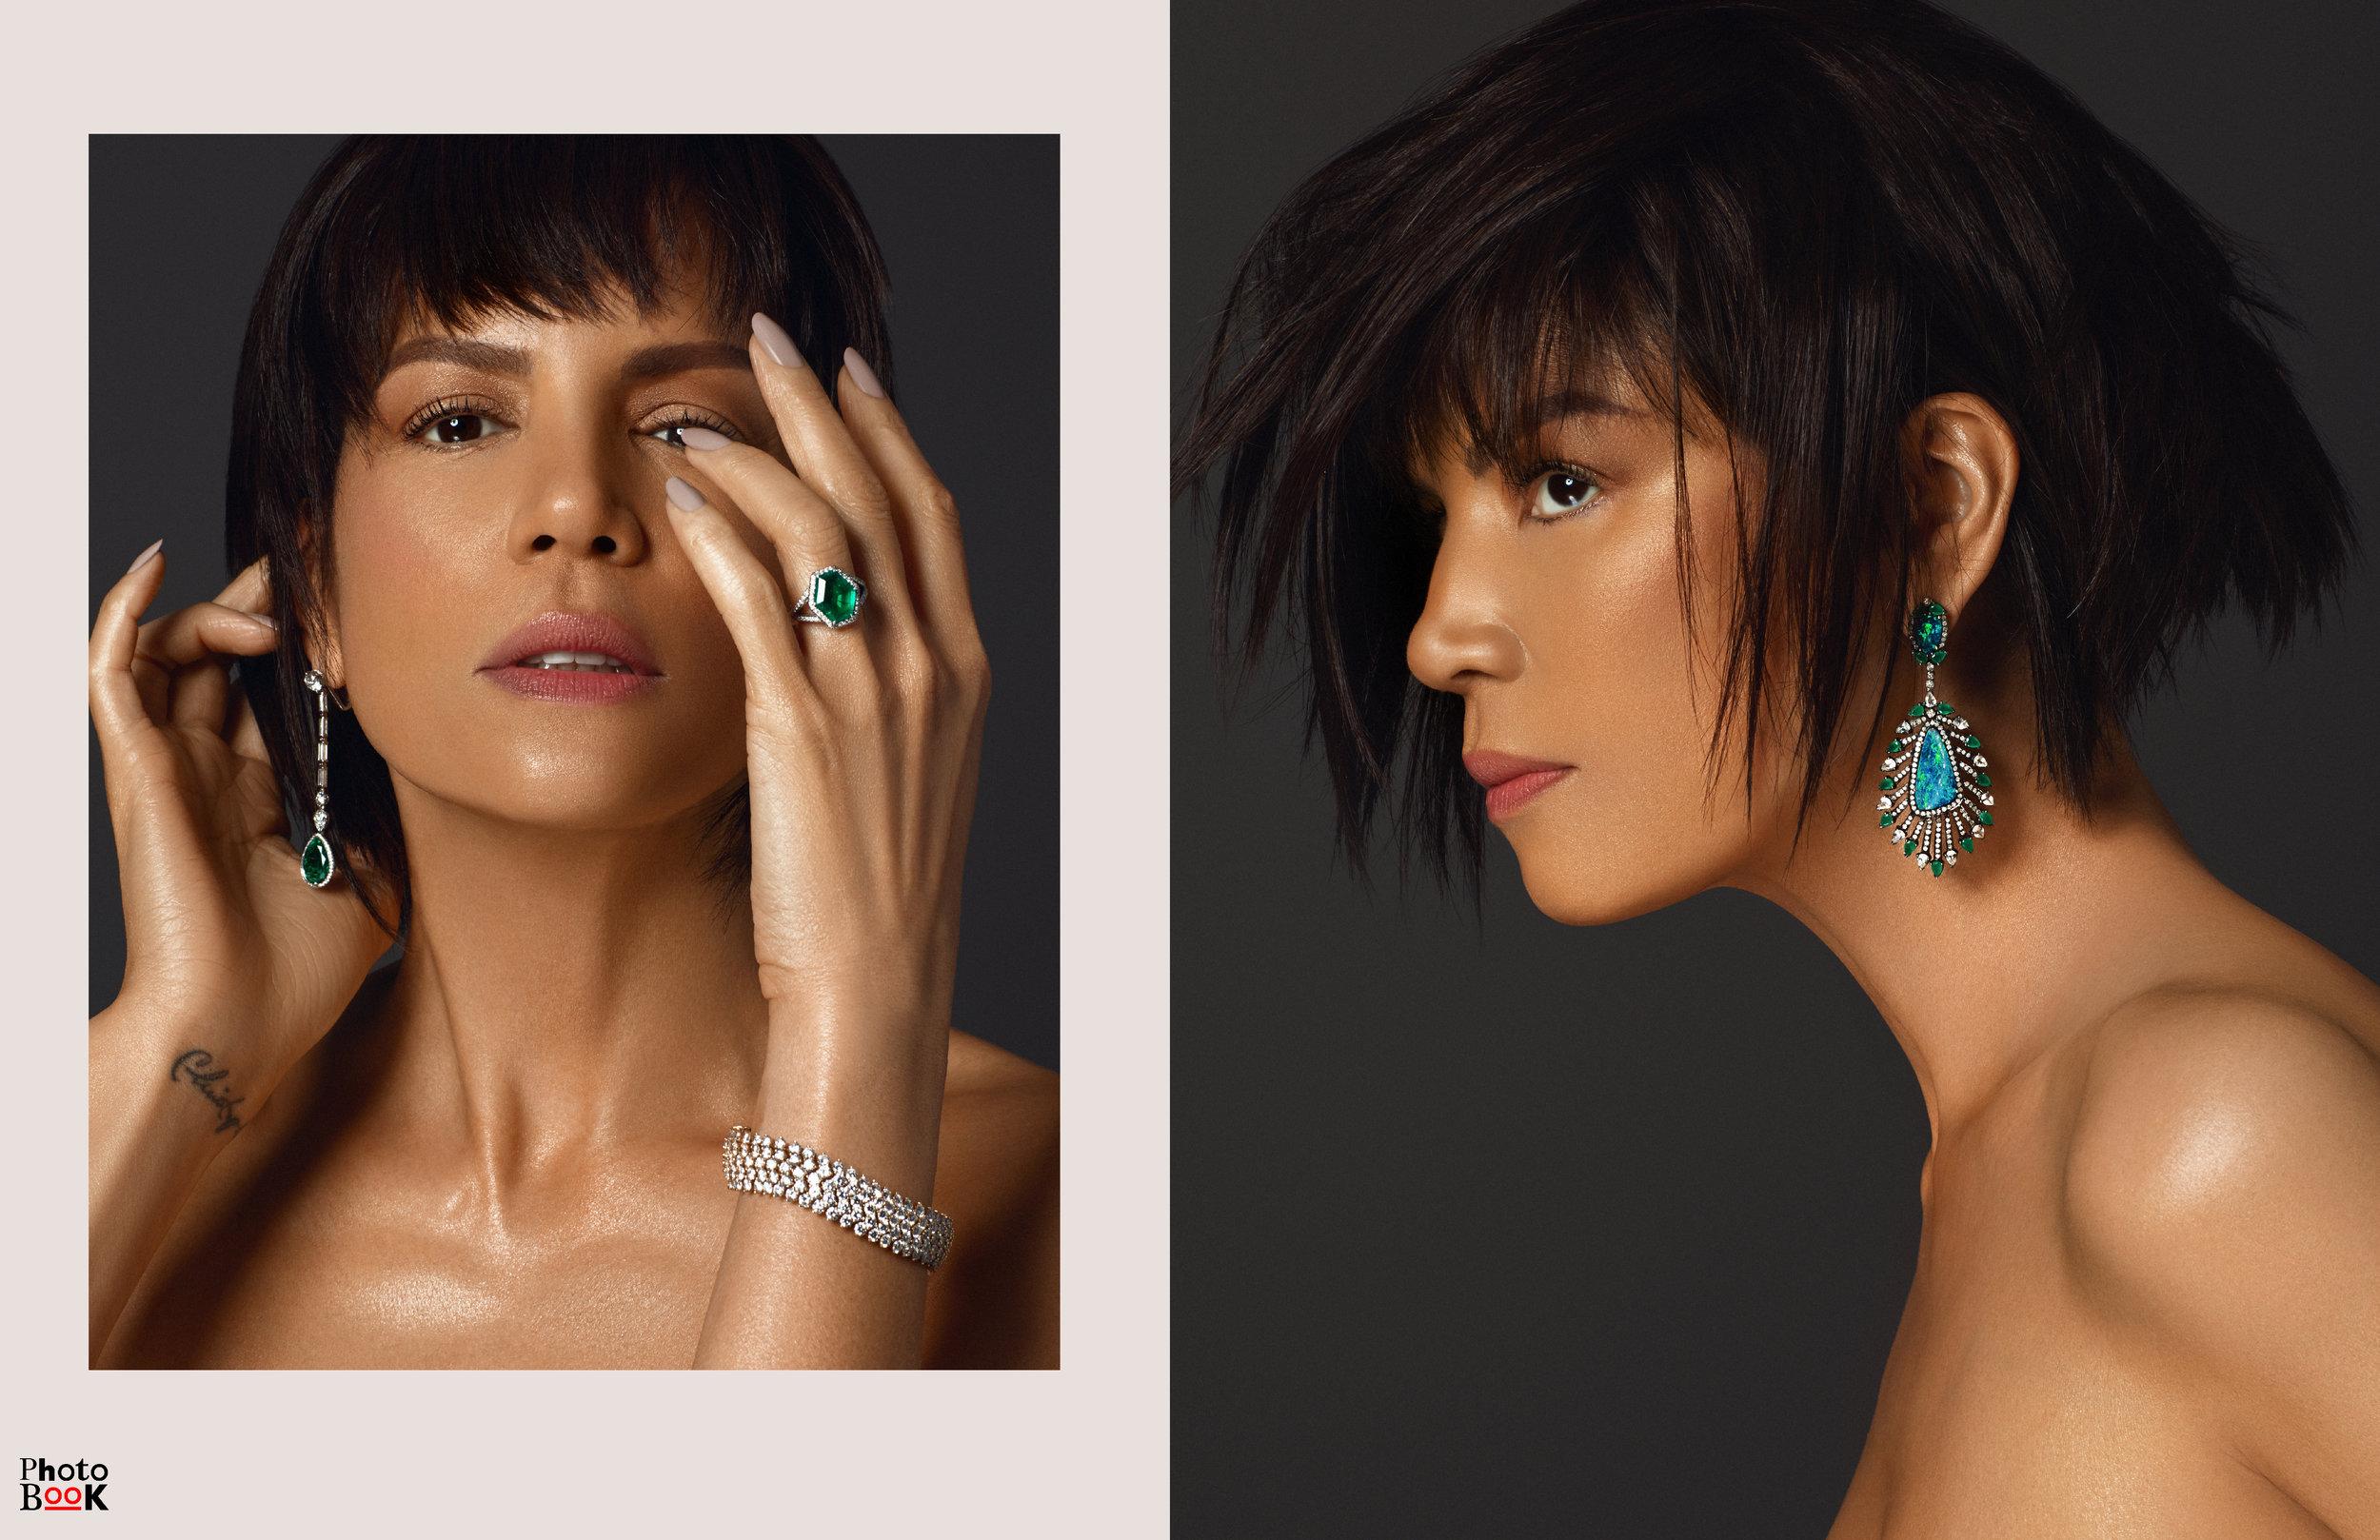 Left:  Earrings: Rafka Silhouette Diamond and Emerald Drop Earrings Ring: Friman & Stein Vintage Diamond and Munoz Mine Emerald Ring Bracelet: David Webb Convertible Diamond Bracelet  Right:  Earrings: Vintage Diamond and Black Opal Feather Drop Earrings